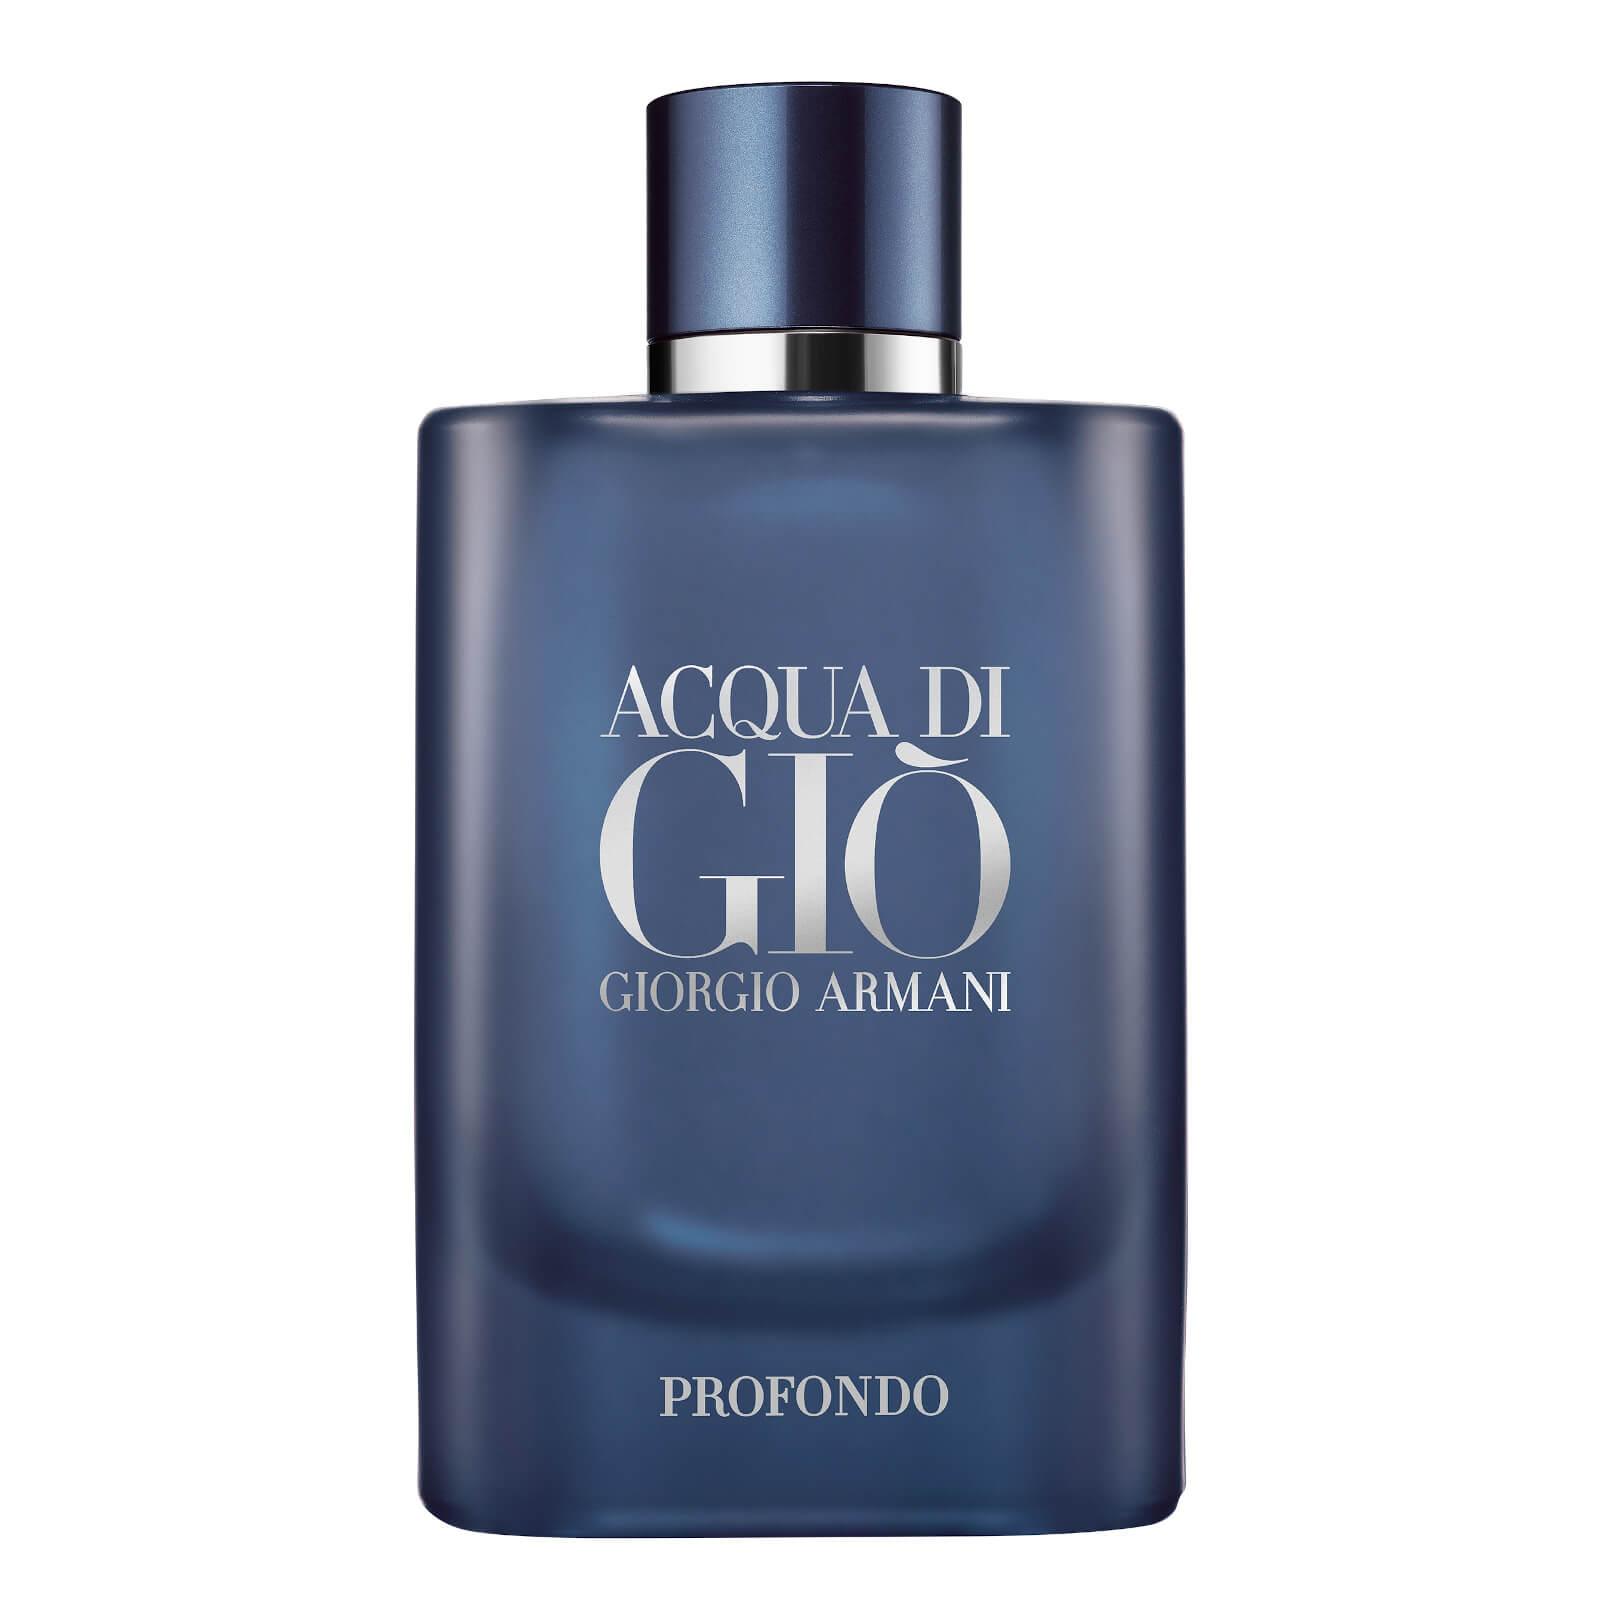 Armani Acqua Di Gio Profondo Eau de Parfum (Various Sizes) - 125ml